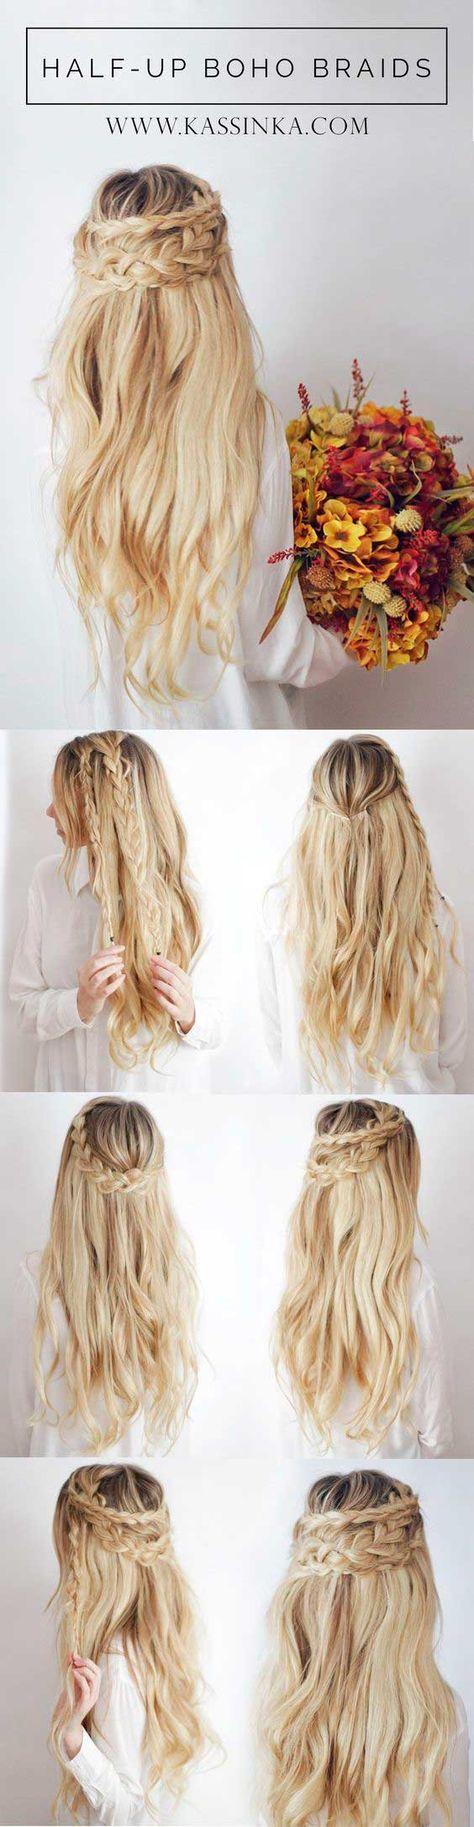 best 25+ cute down hairstyles ideas on pinterest | cute simple